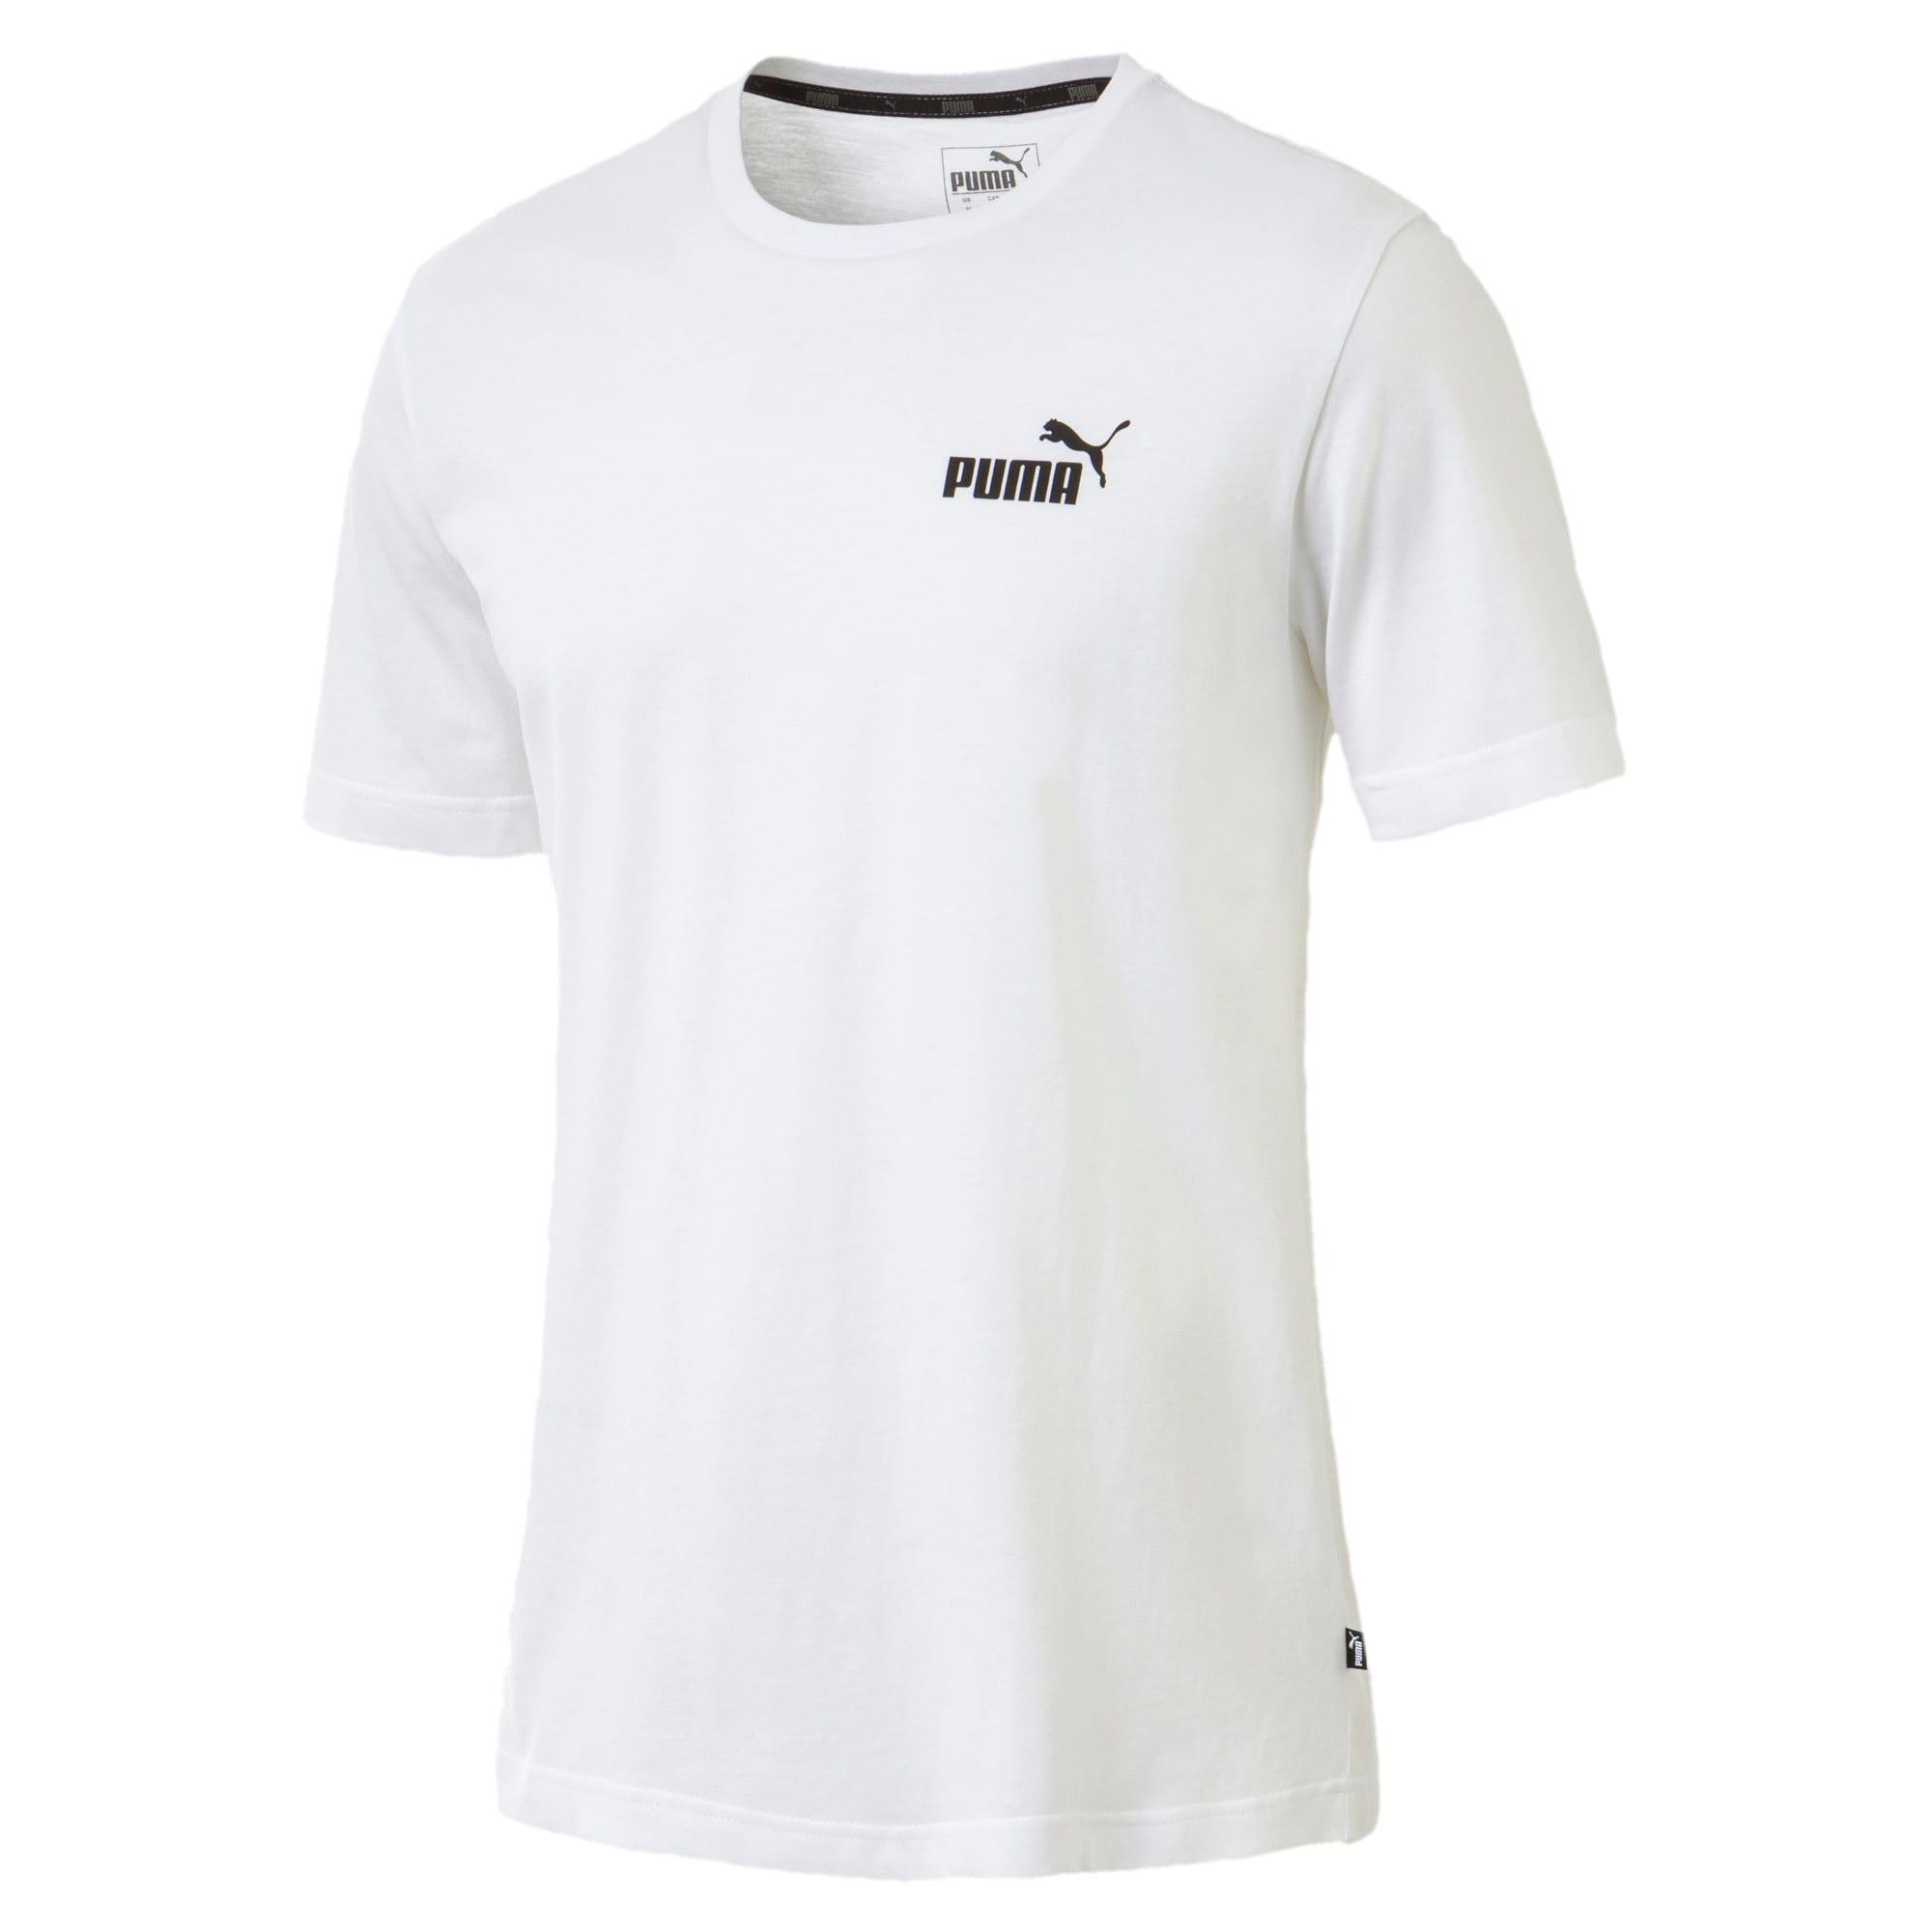 Thumbnail 1 of T-shirt con logo piccolo Essentials uomo, Puma White, medium